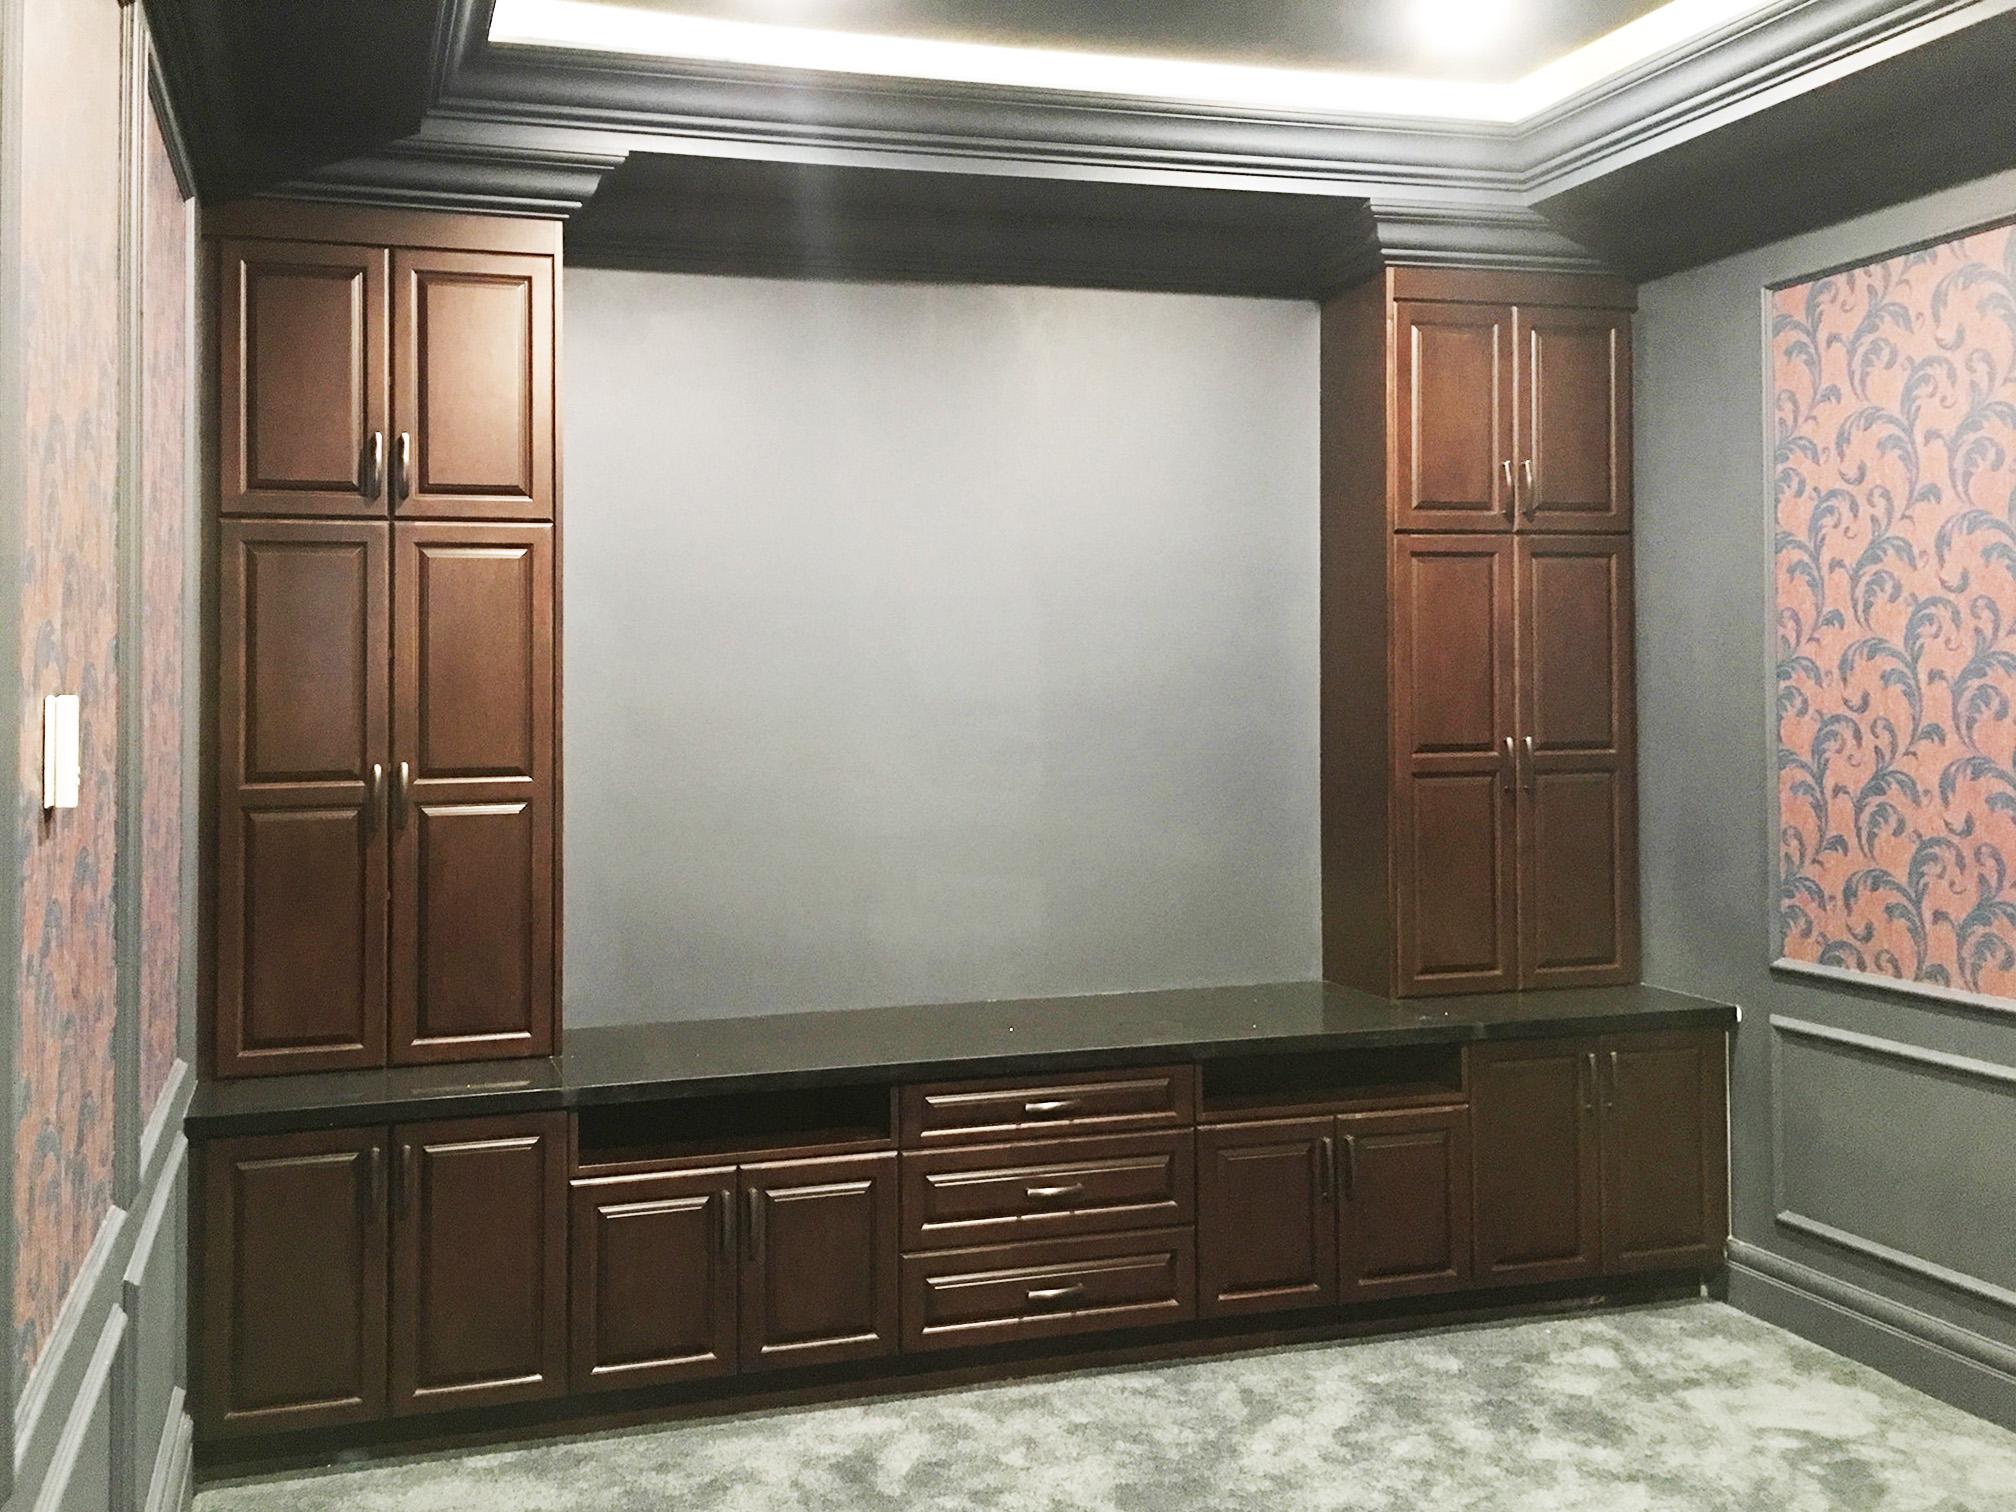 Rise Panel Kitchen Cabinet